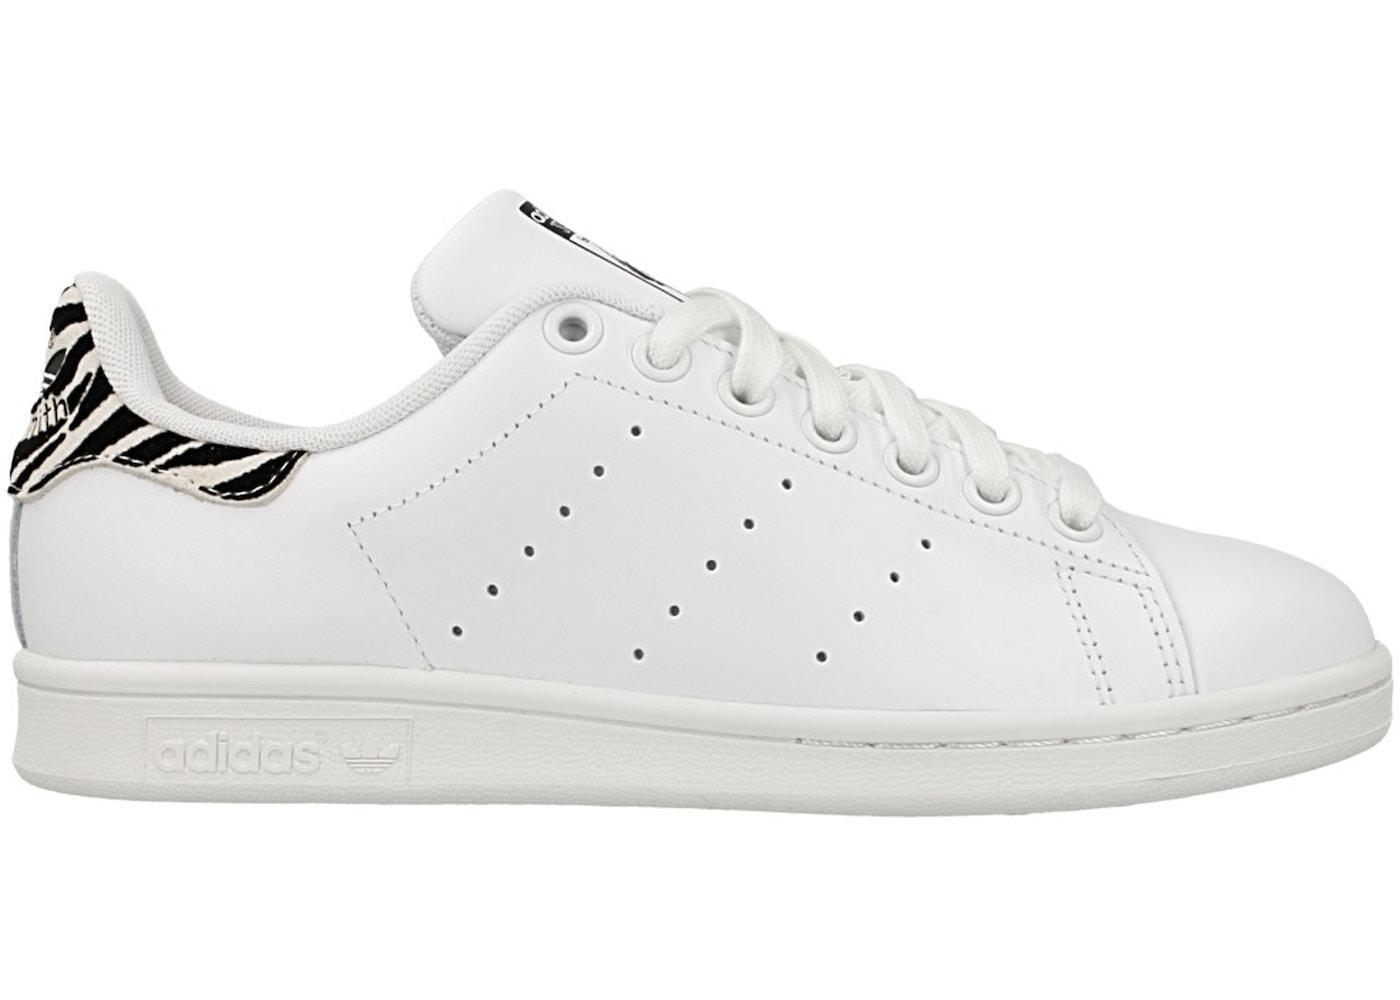 adidas stan smith zebra sneakers